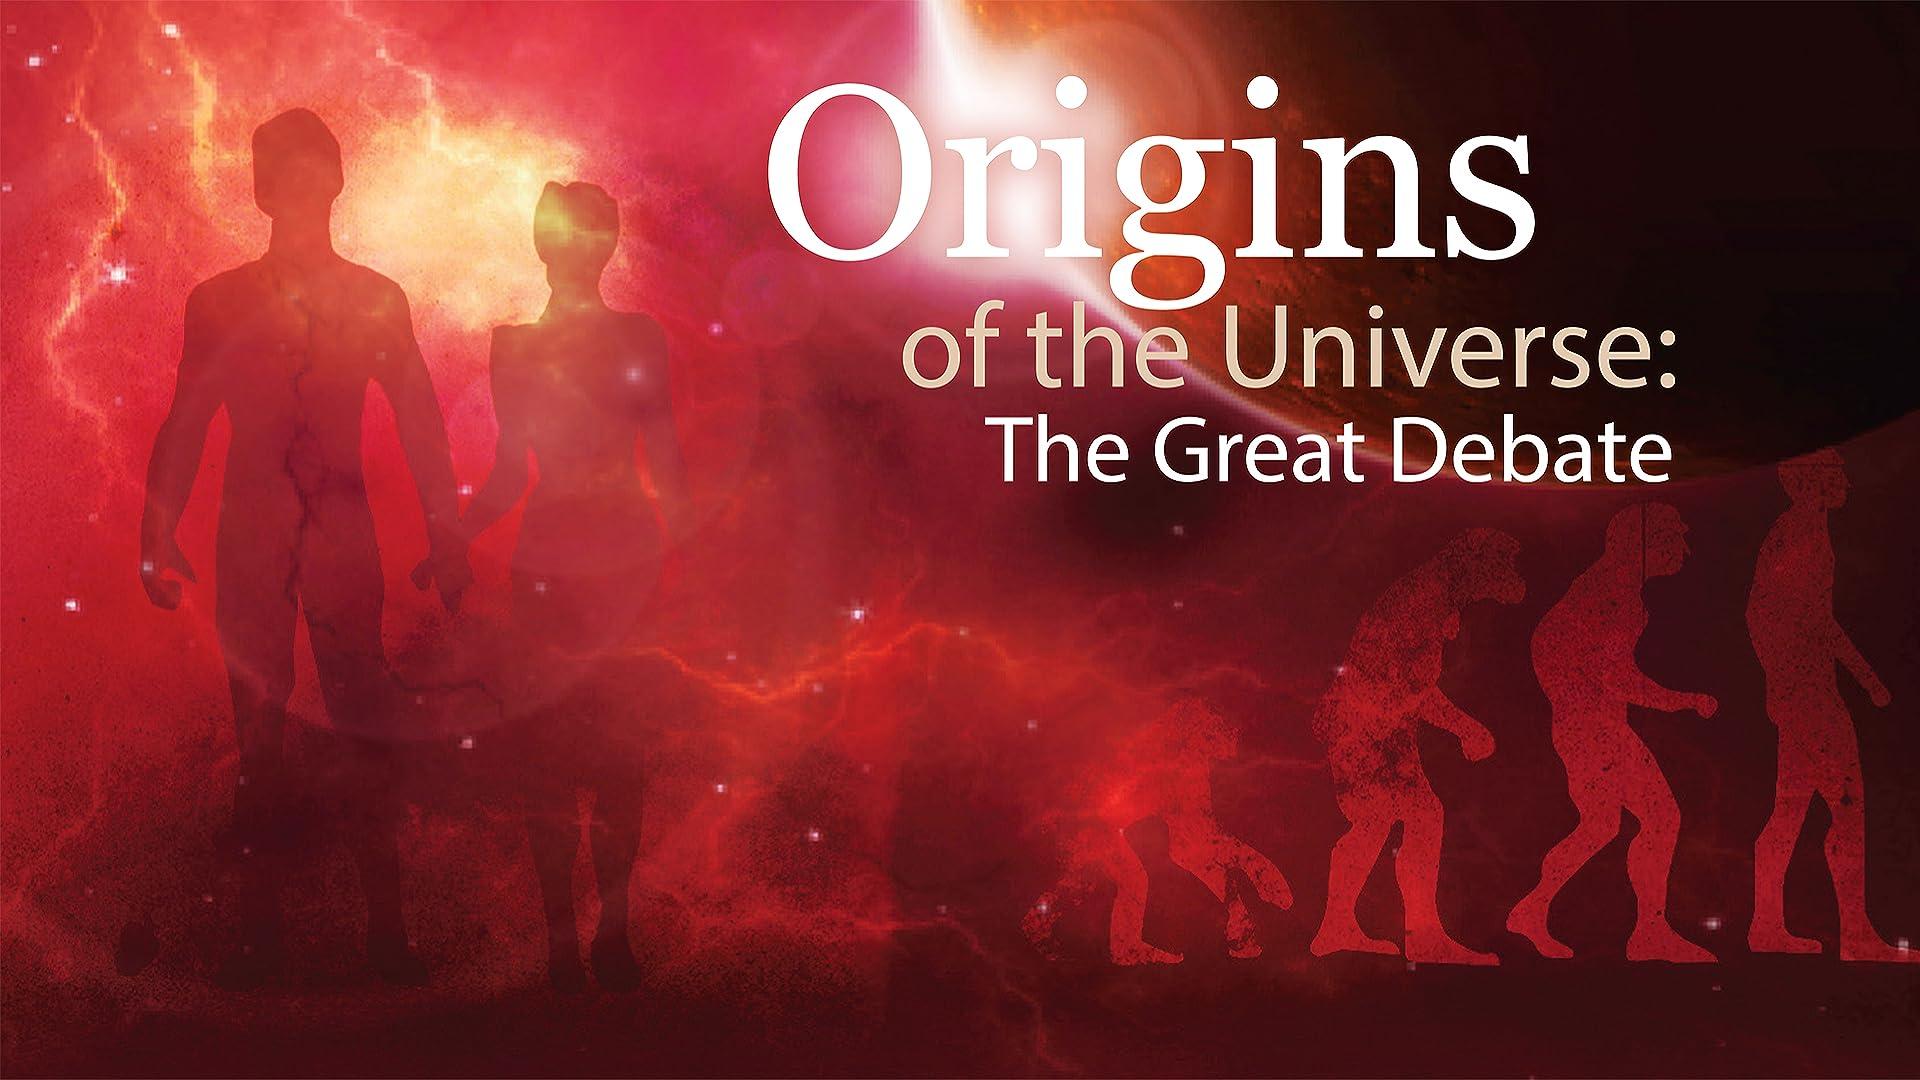 Origins of the Universe: The Great Debate